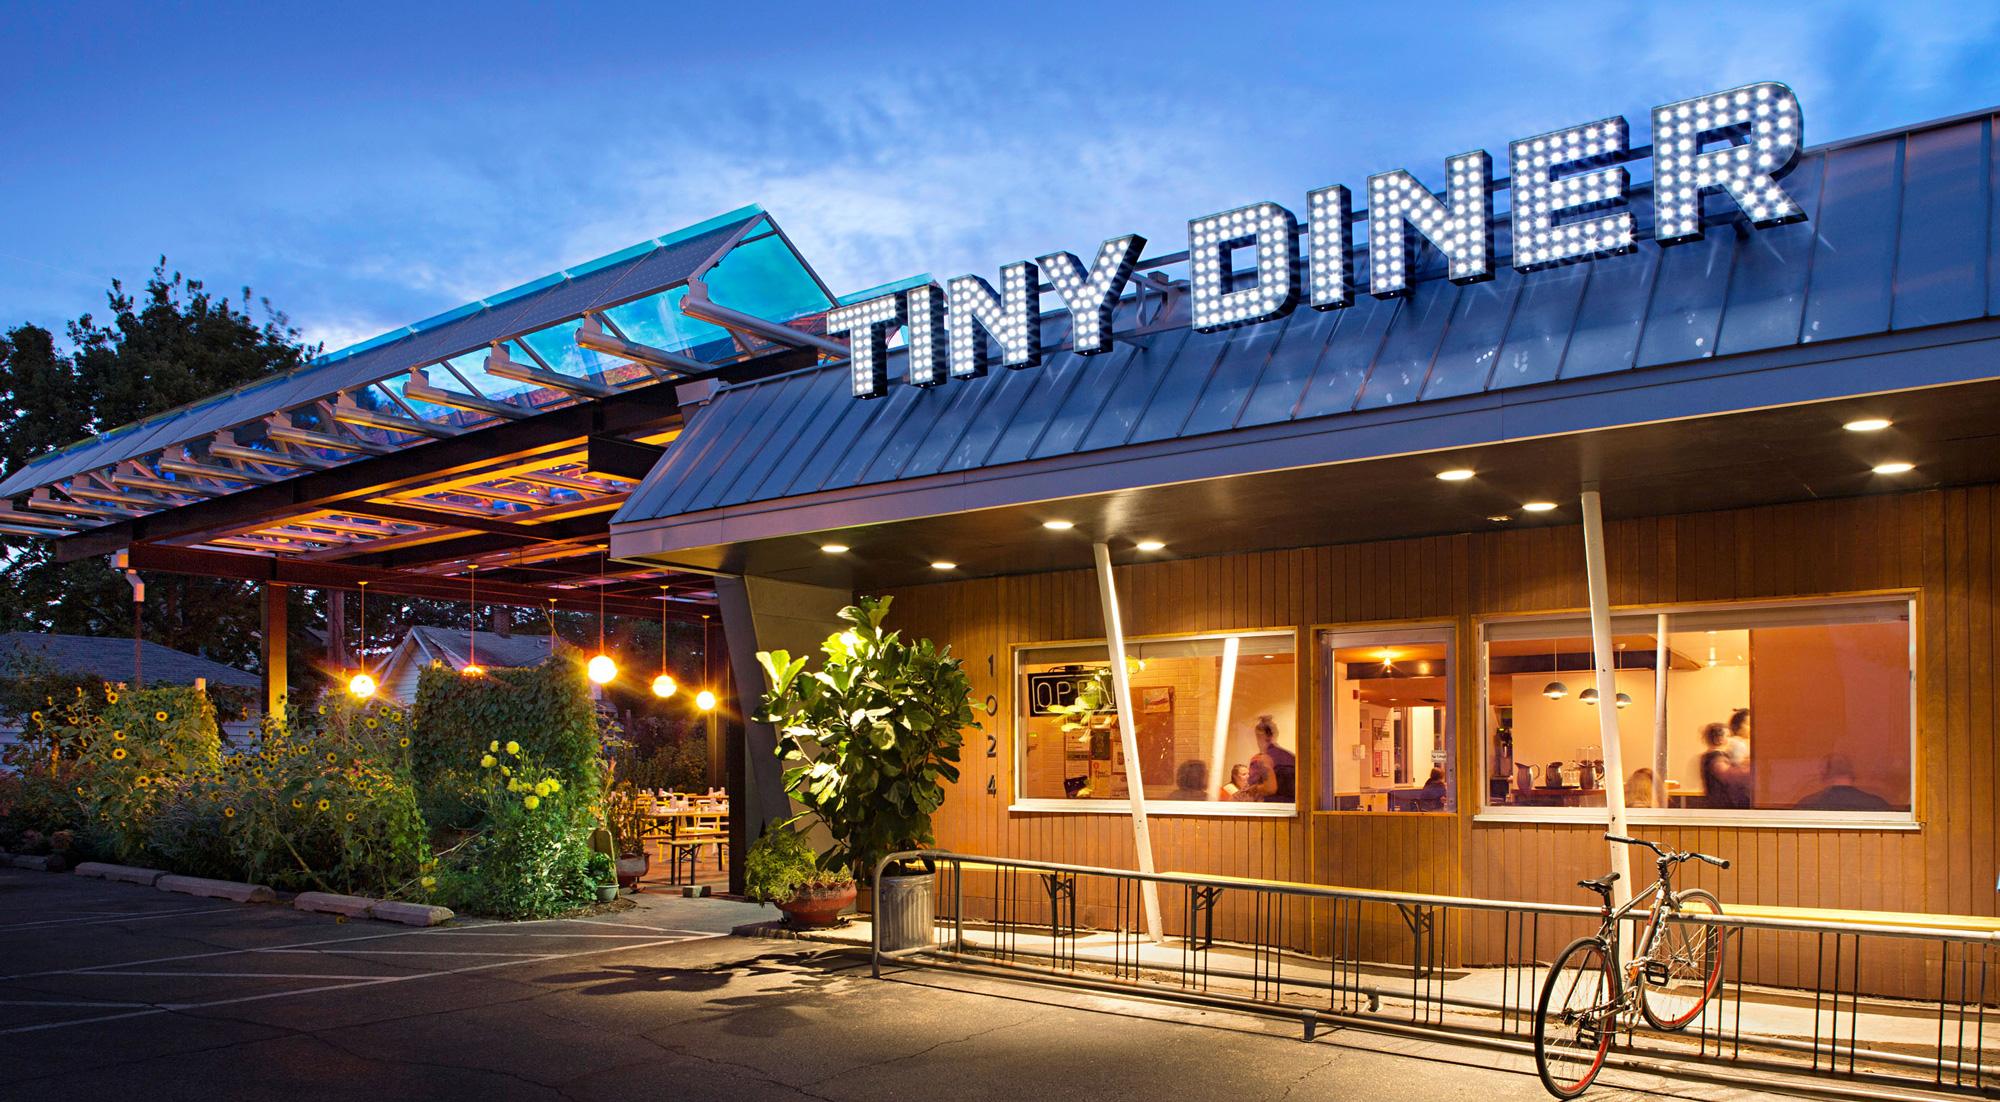 Tiny Diner